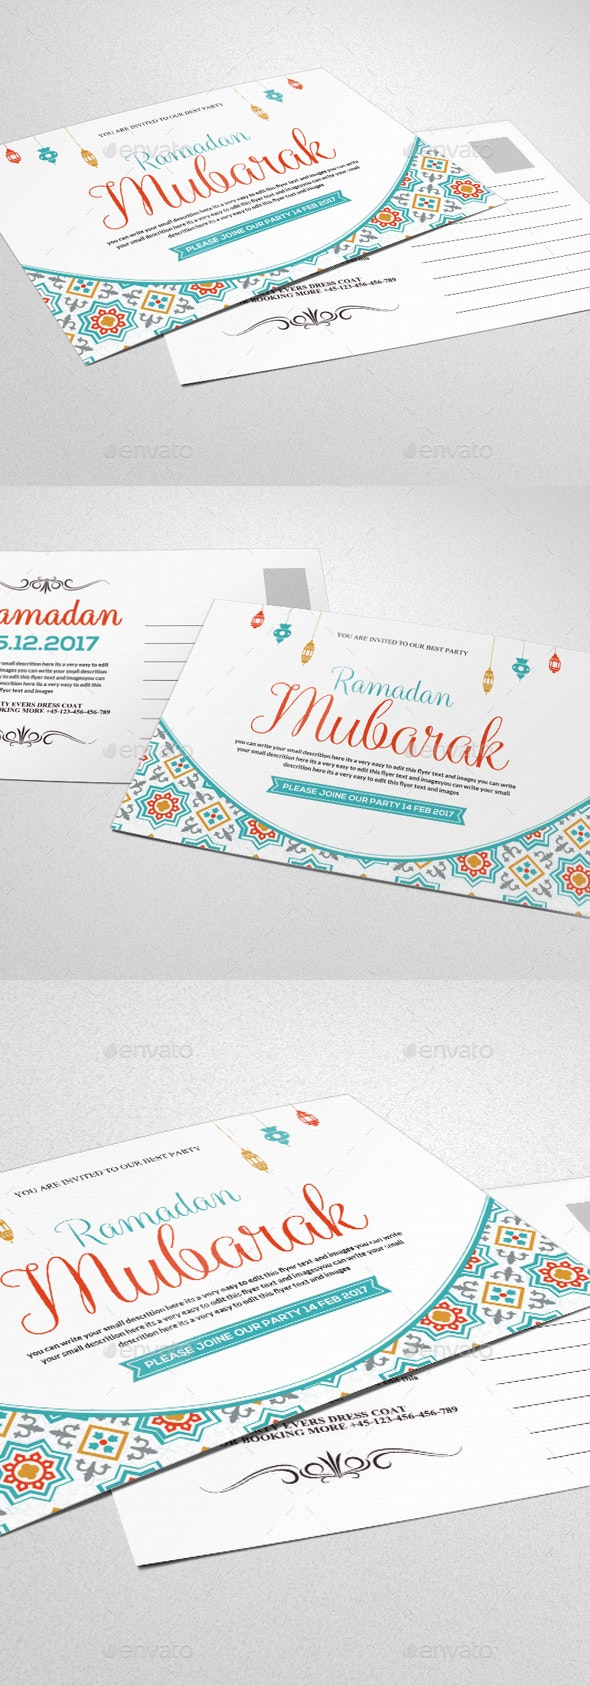 Ramadan & Eid Mubarak Greeting Card - Cards & Invites Print Templates